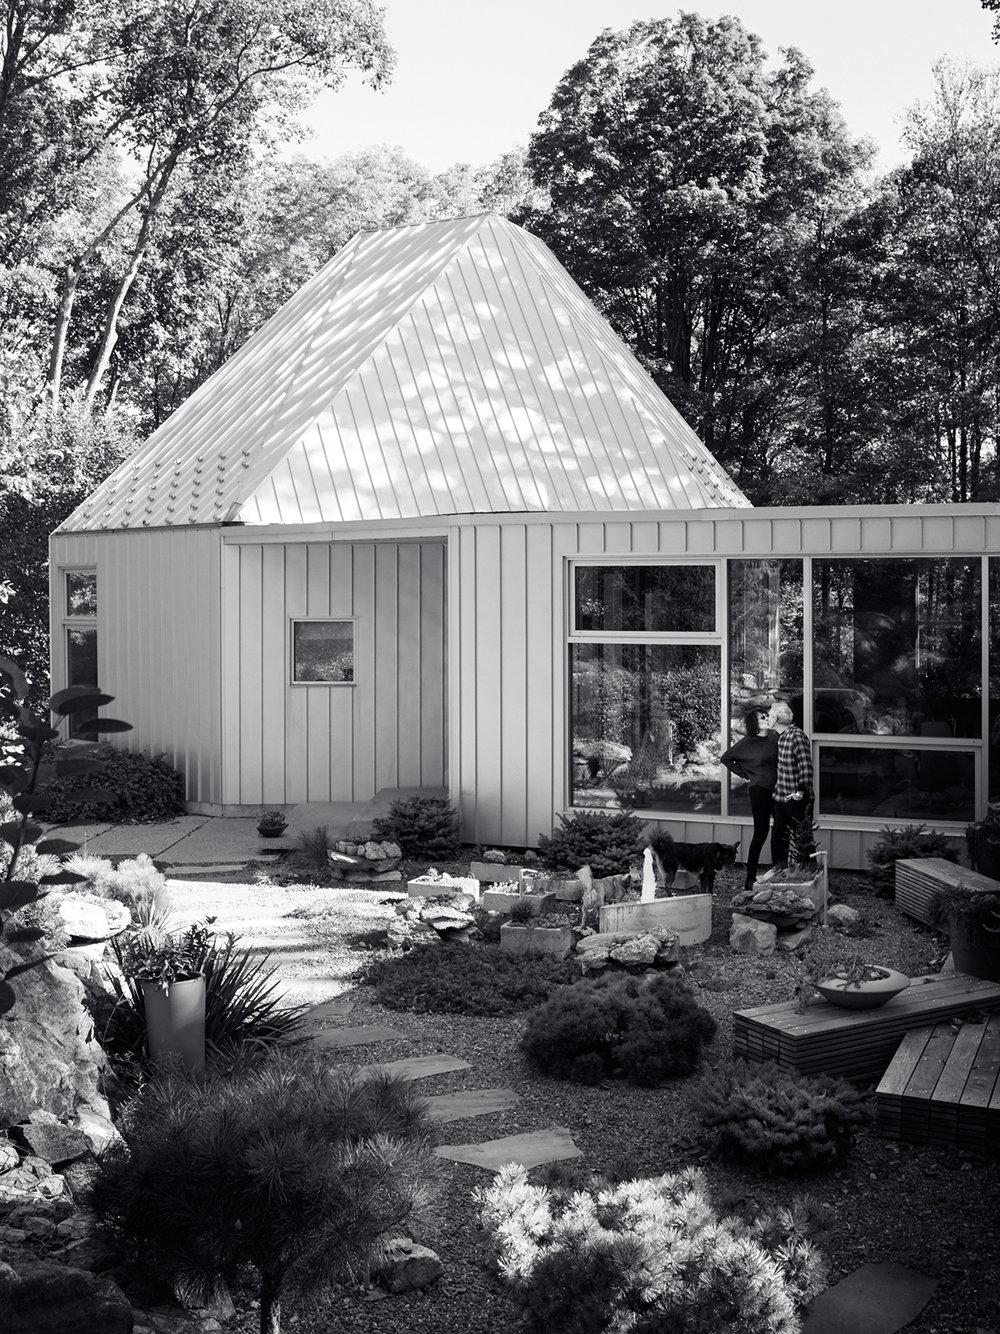 Minter and her hubby, Bill Miller, kissing in their succulent backyard garden.